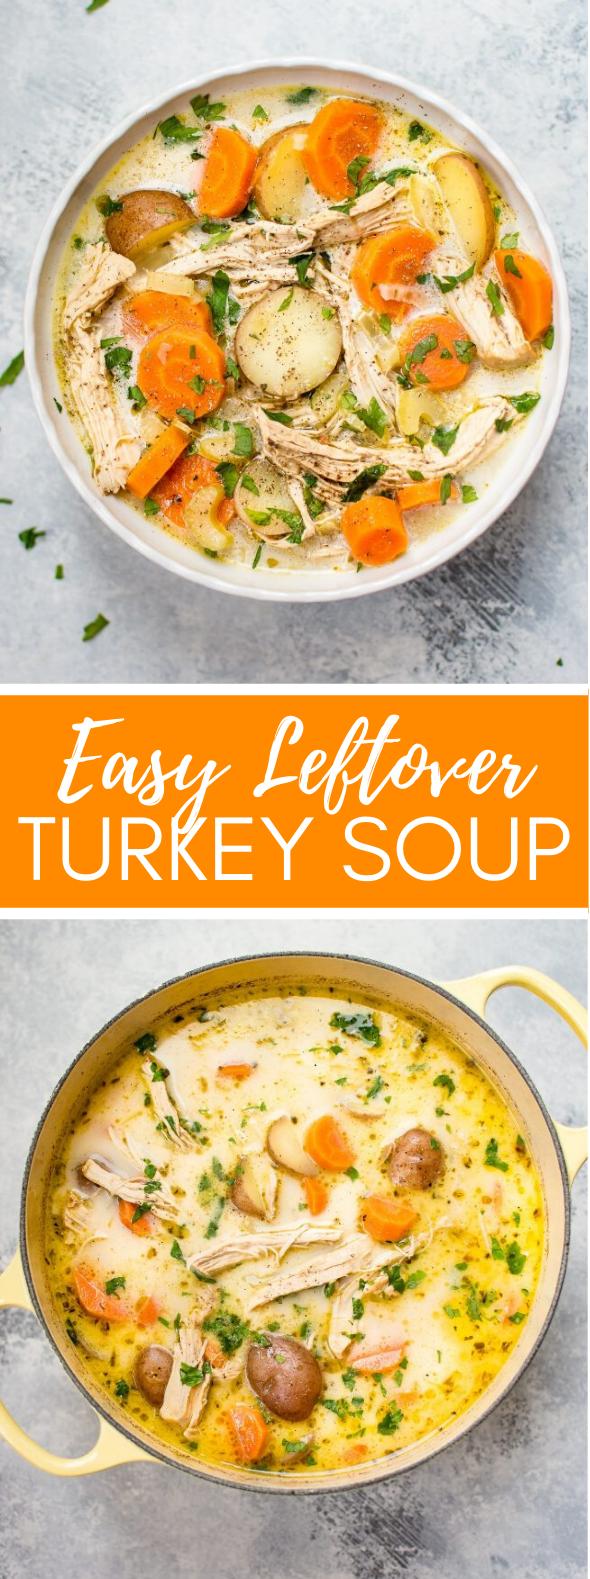 Easy Leftover Turkey Soup Recipe #lunch #veggies